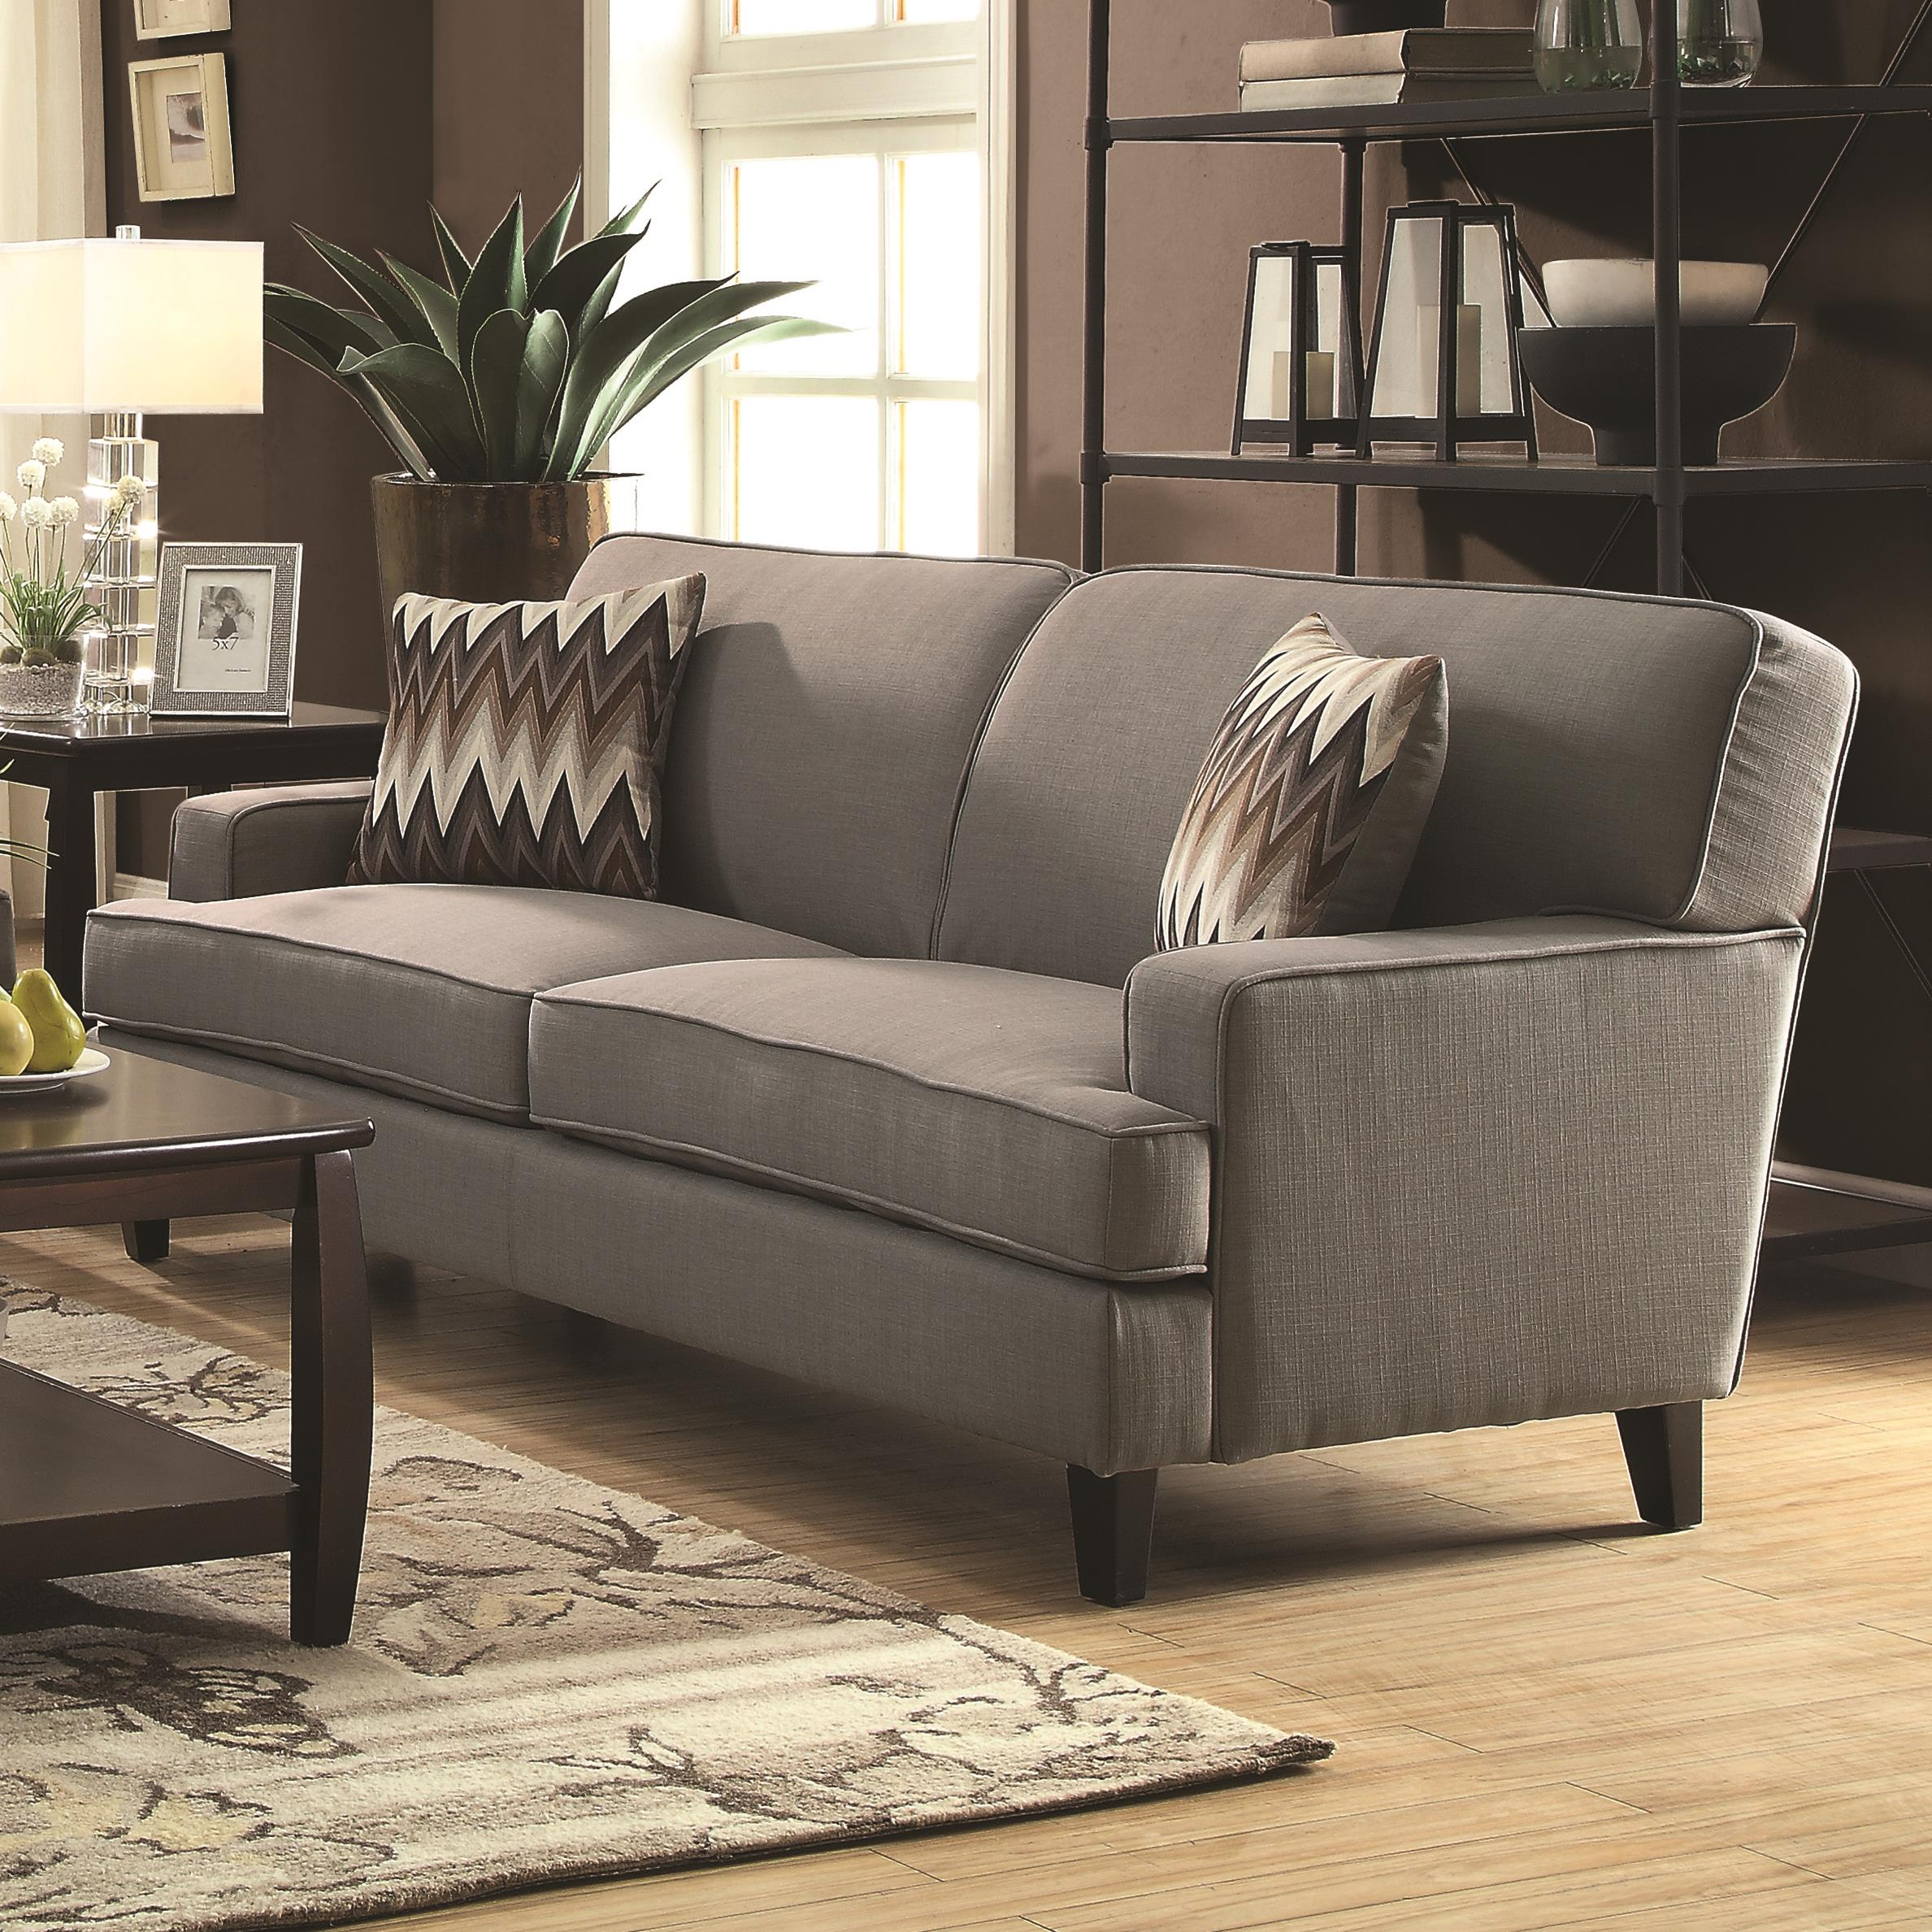 Coaster Finley Sofa - Item Number: 505031